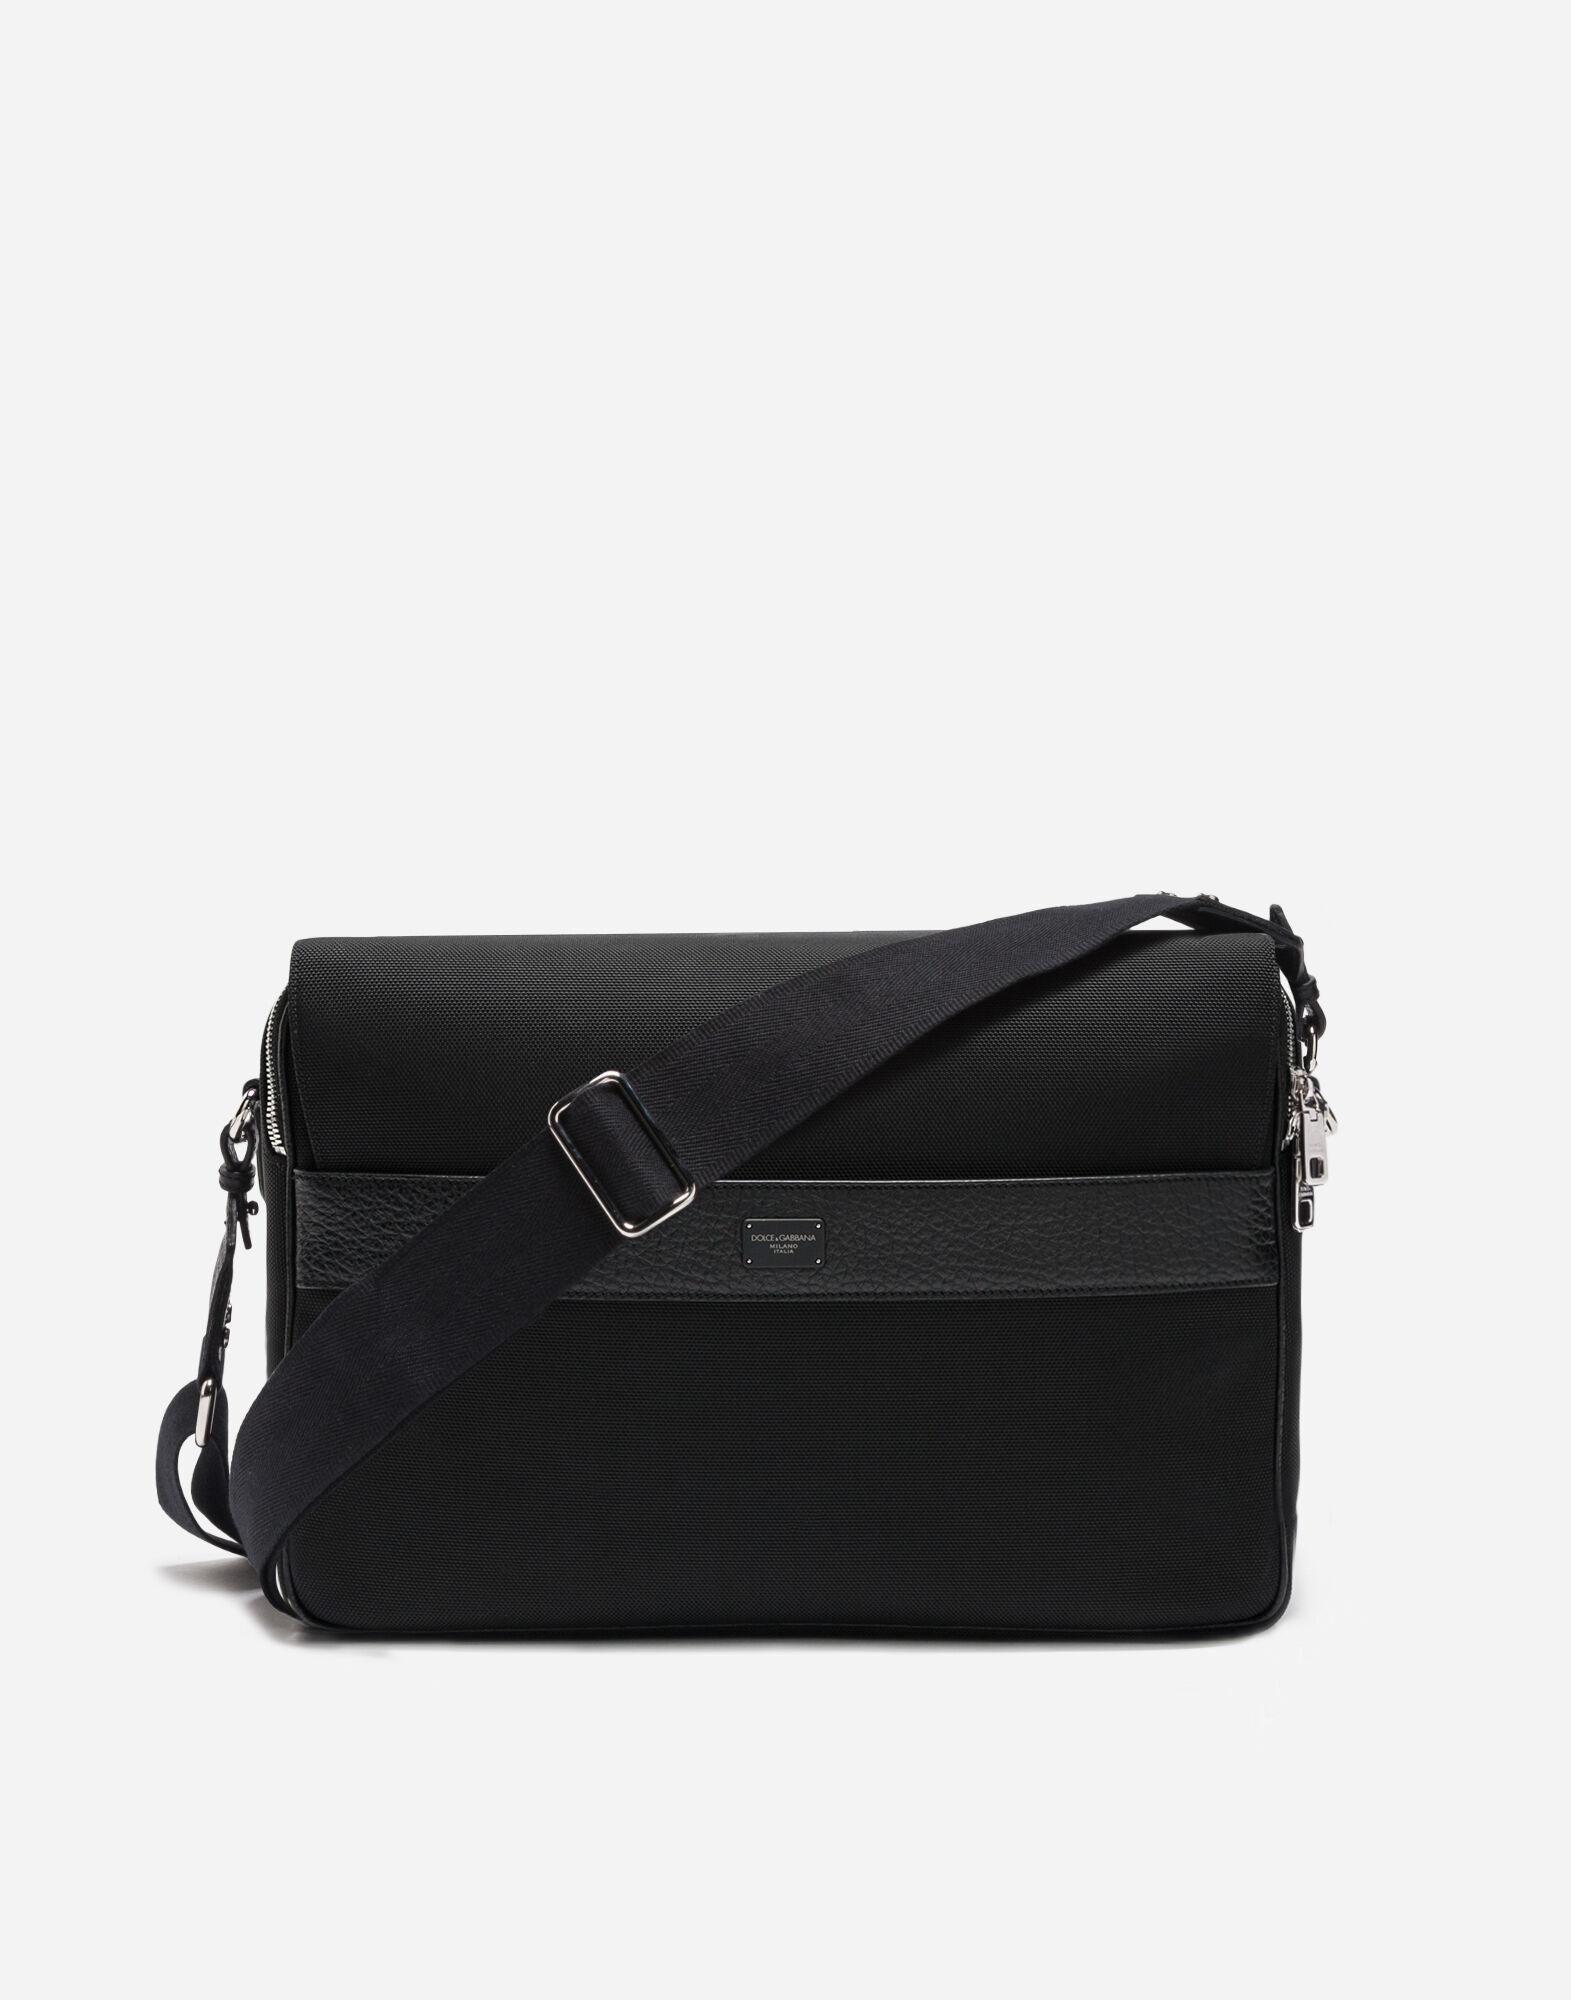 Dolce&Gabbana MESSENGER BAG IN CANVAS